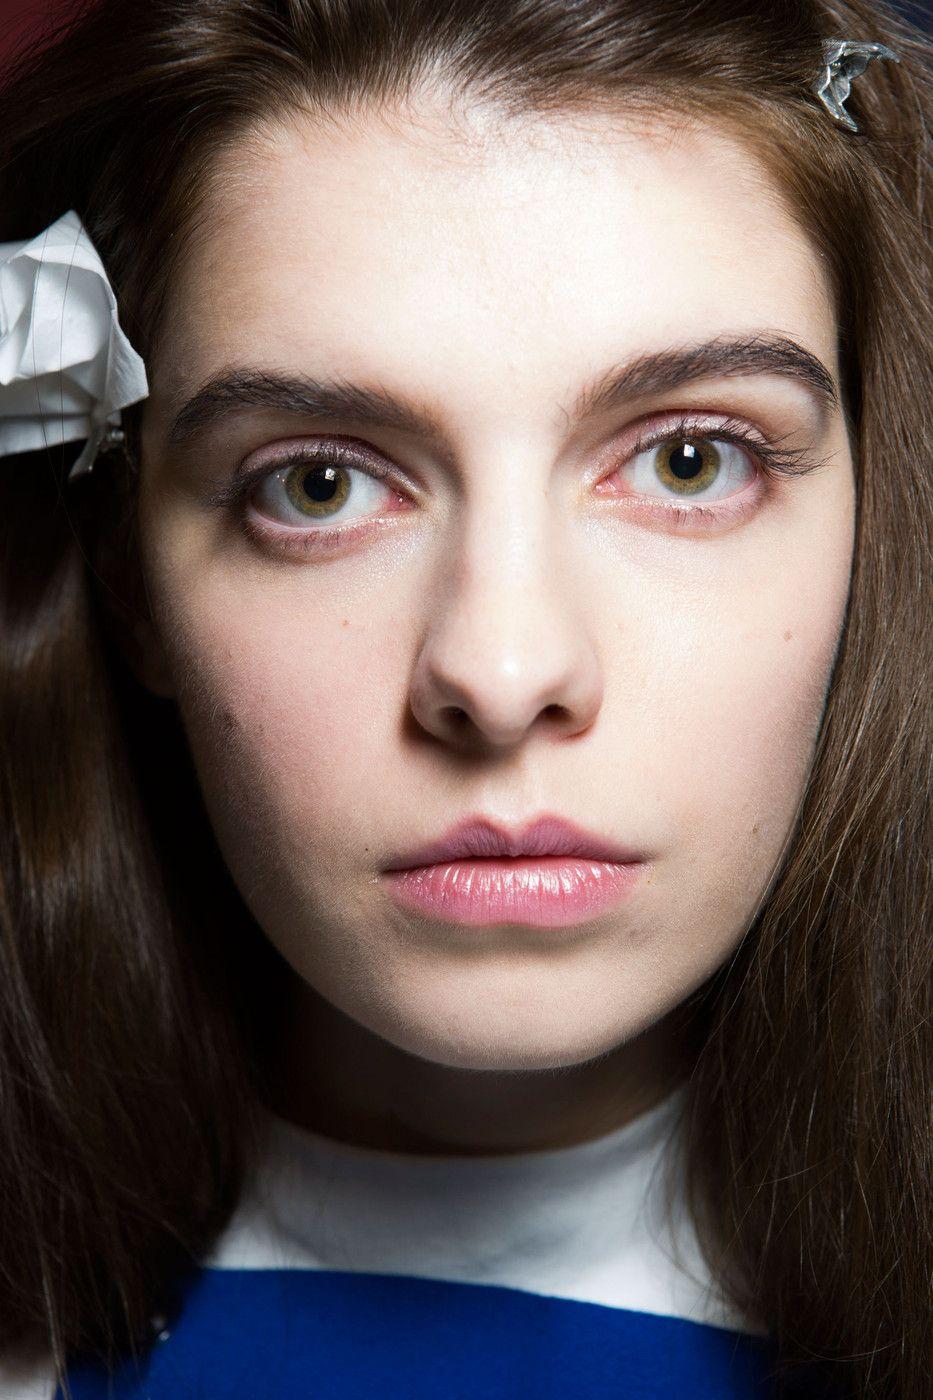 Jacquemus at Paris Fall 2014. http://votetrends.com/polls/369/share #makeup #beauty #runway #backstage